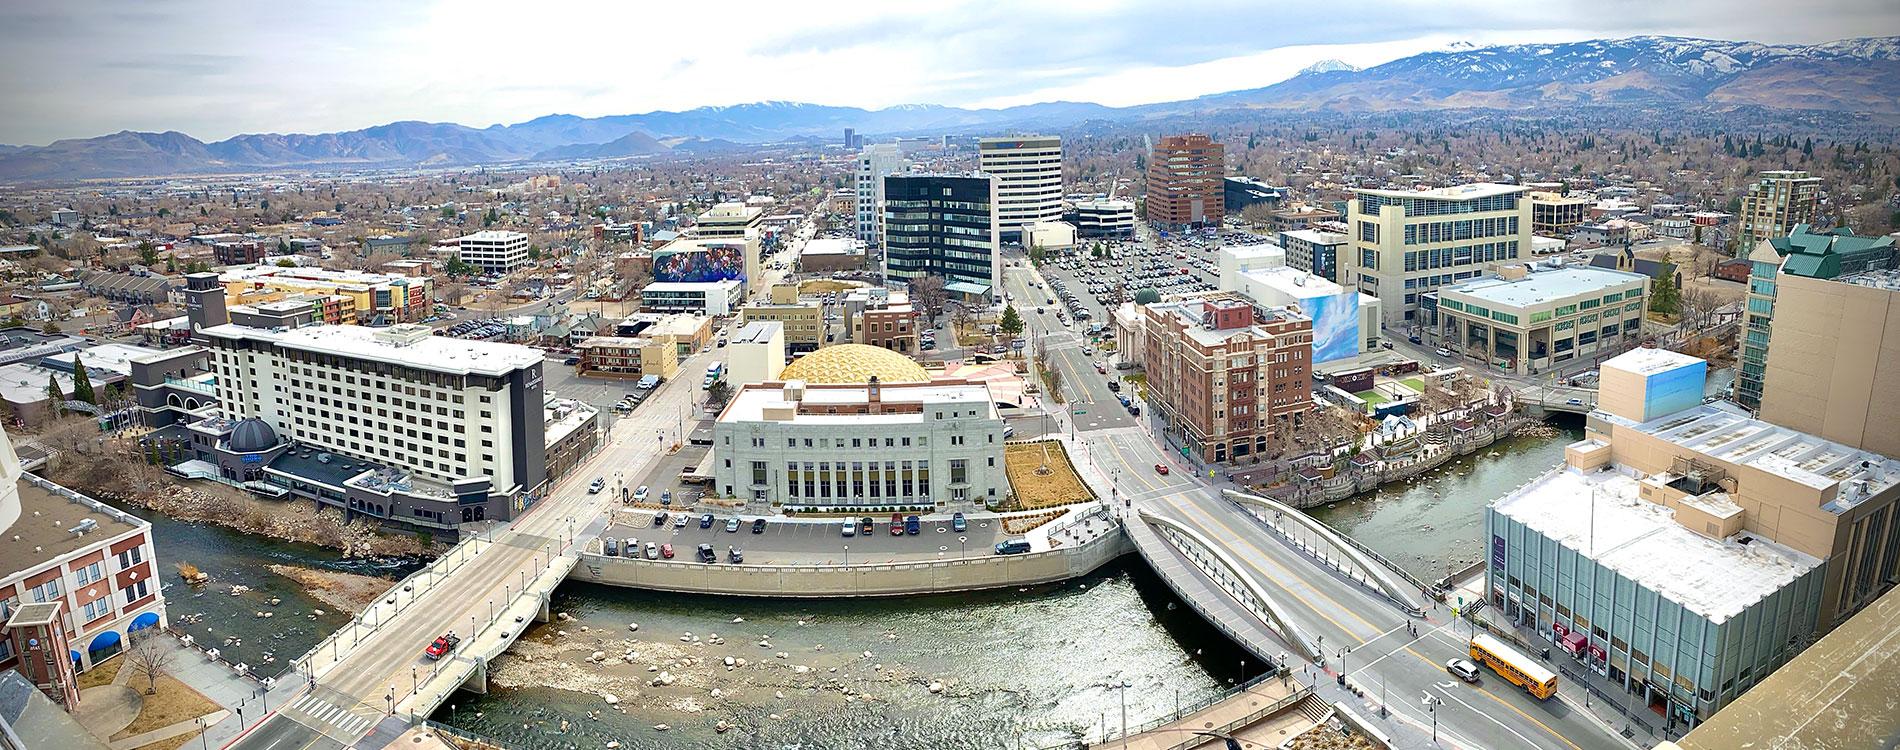 City of Reno | Home - Reno.gov